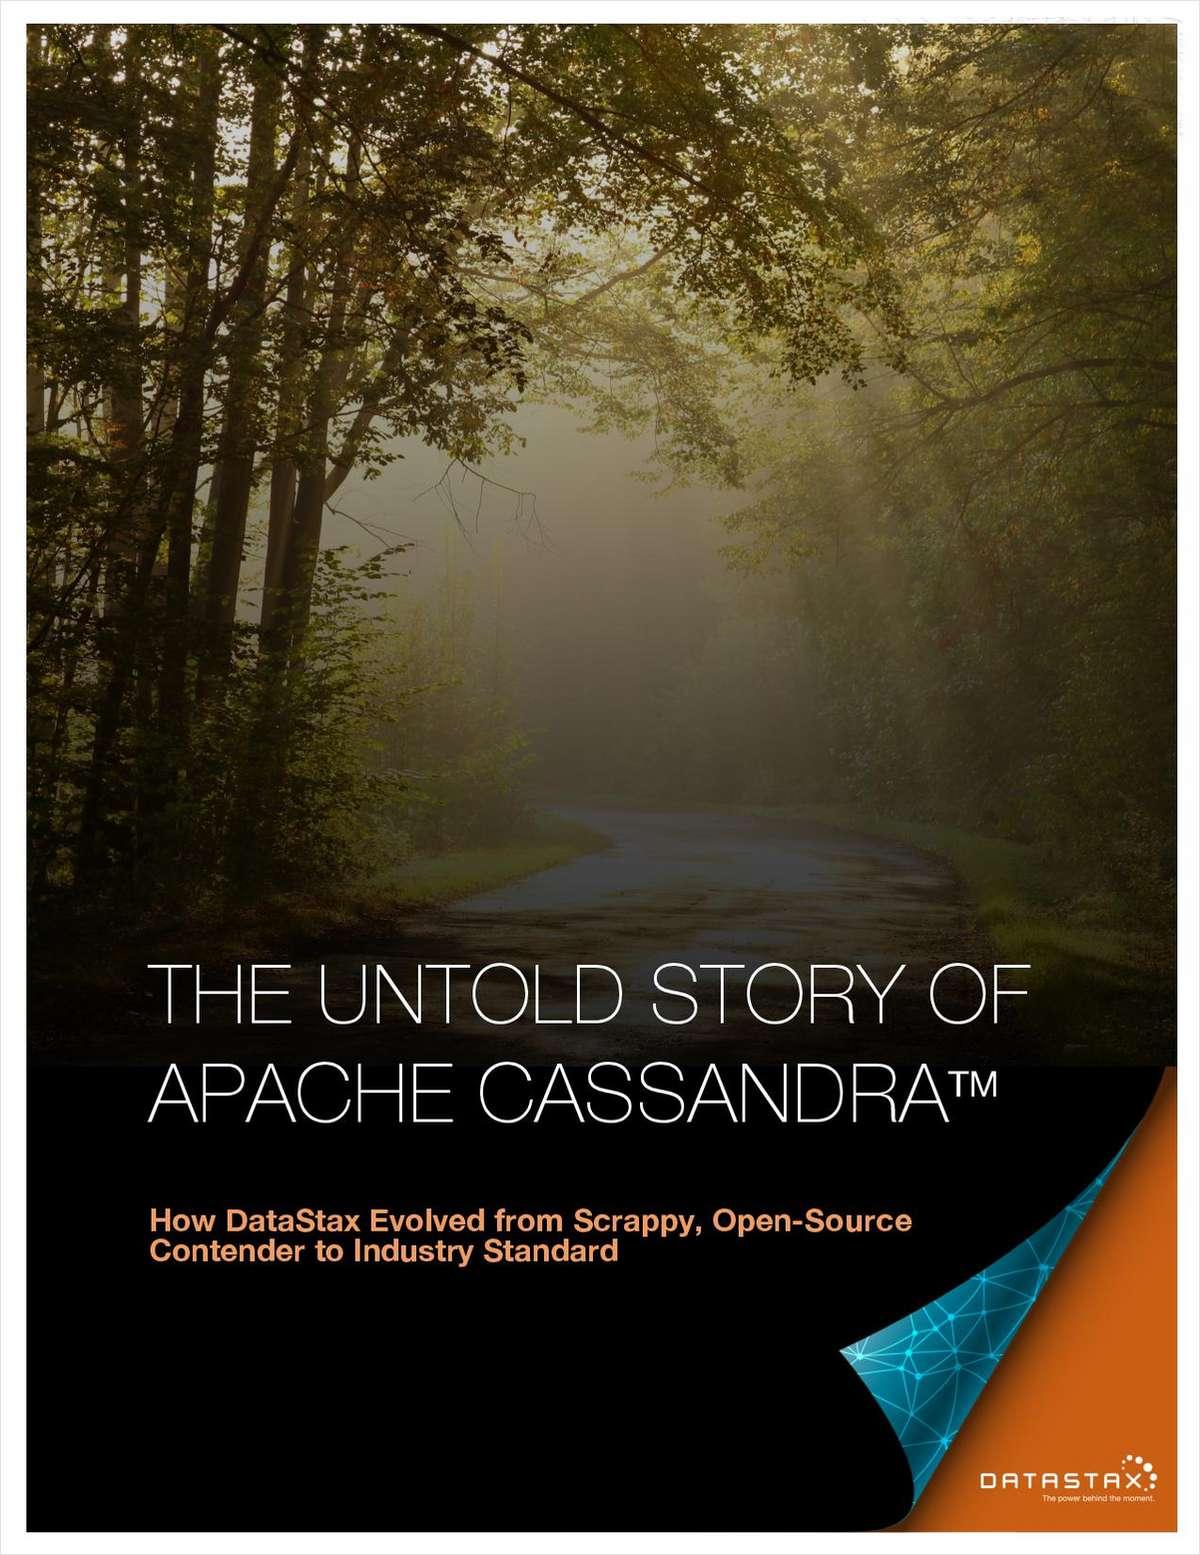 The Untold Story of Apache Cassandra